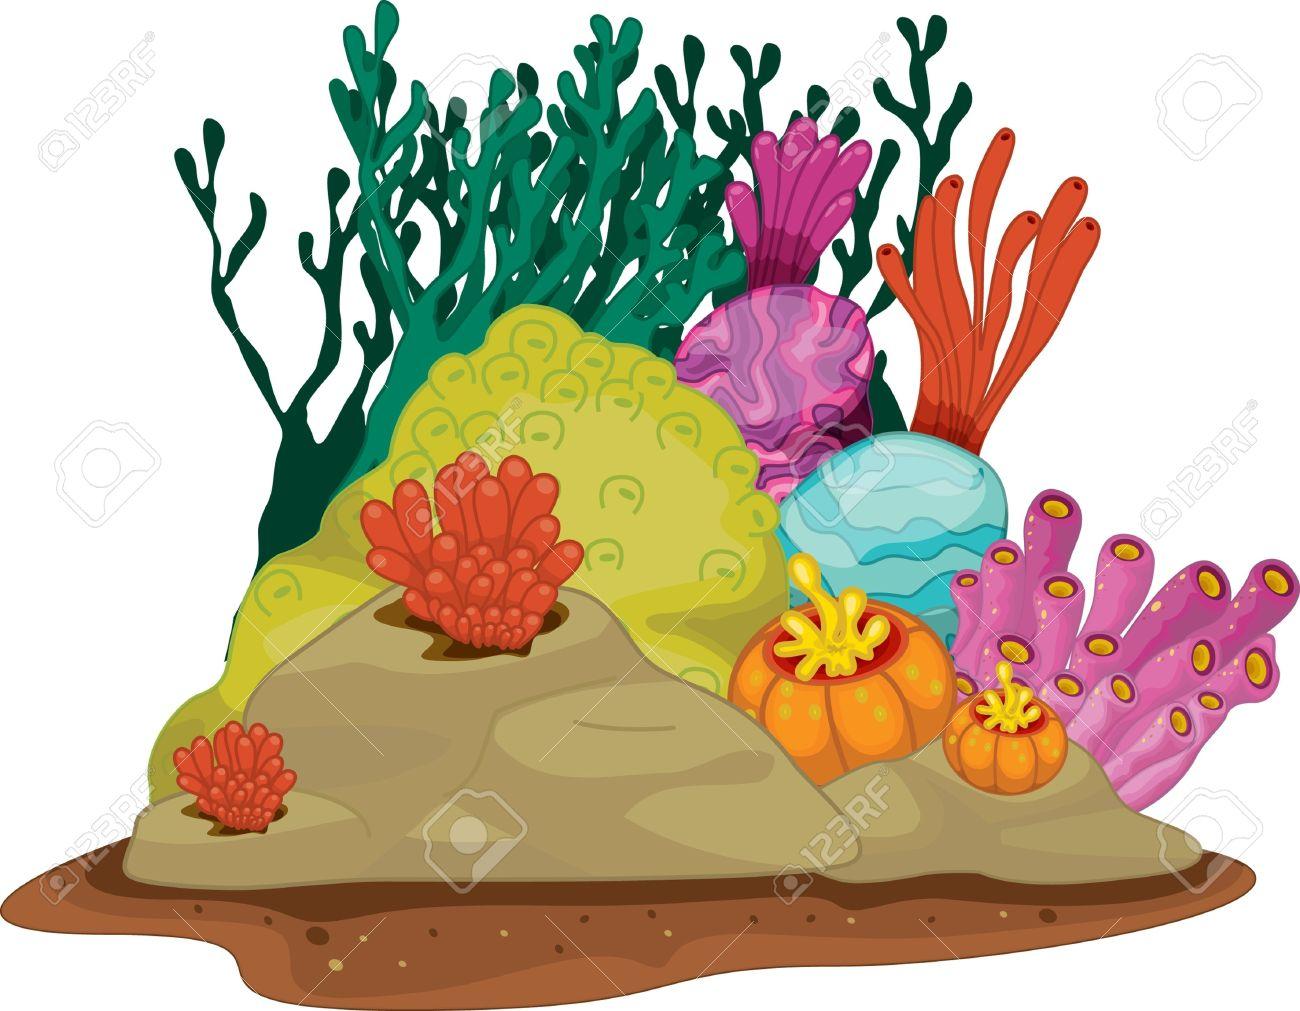 Plant clipart sea plant Plants Underwater Clipart ocean Zone